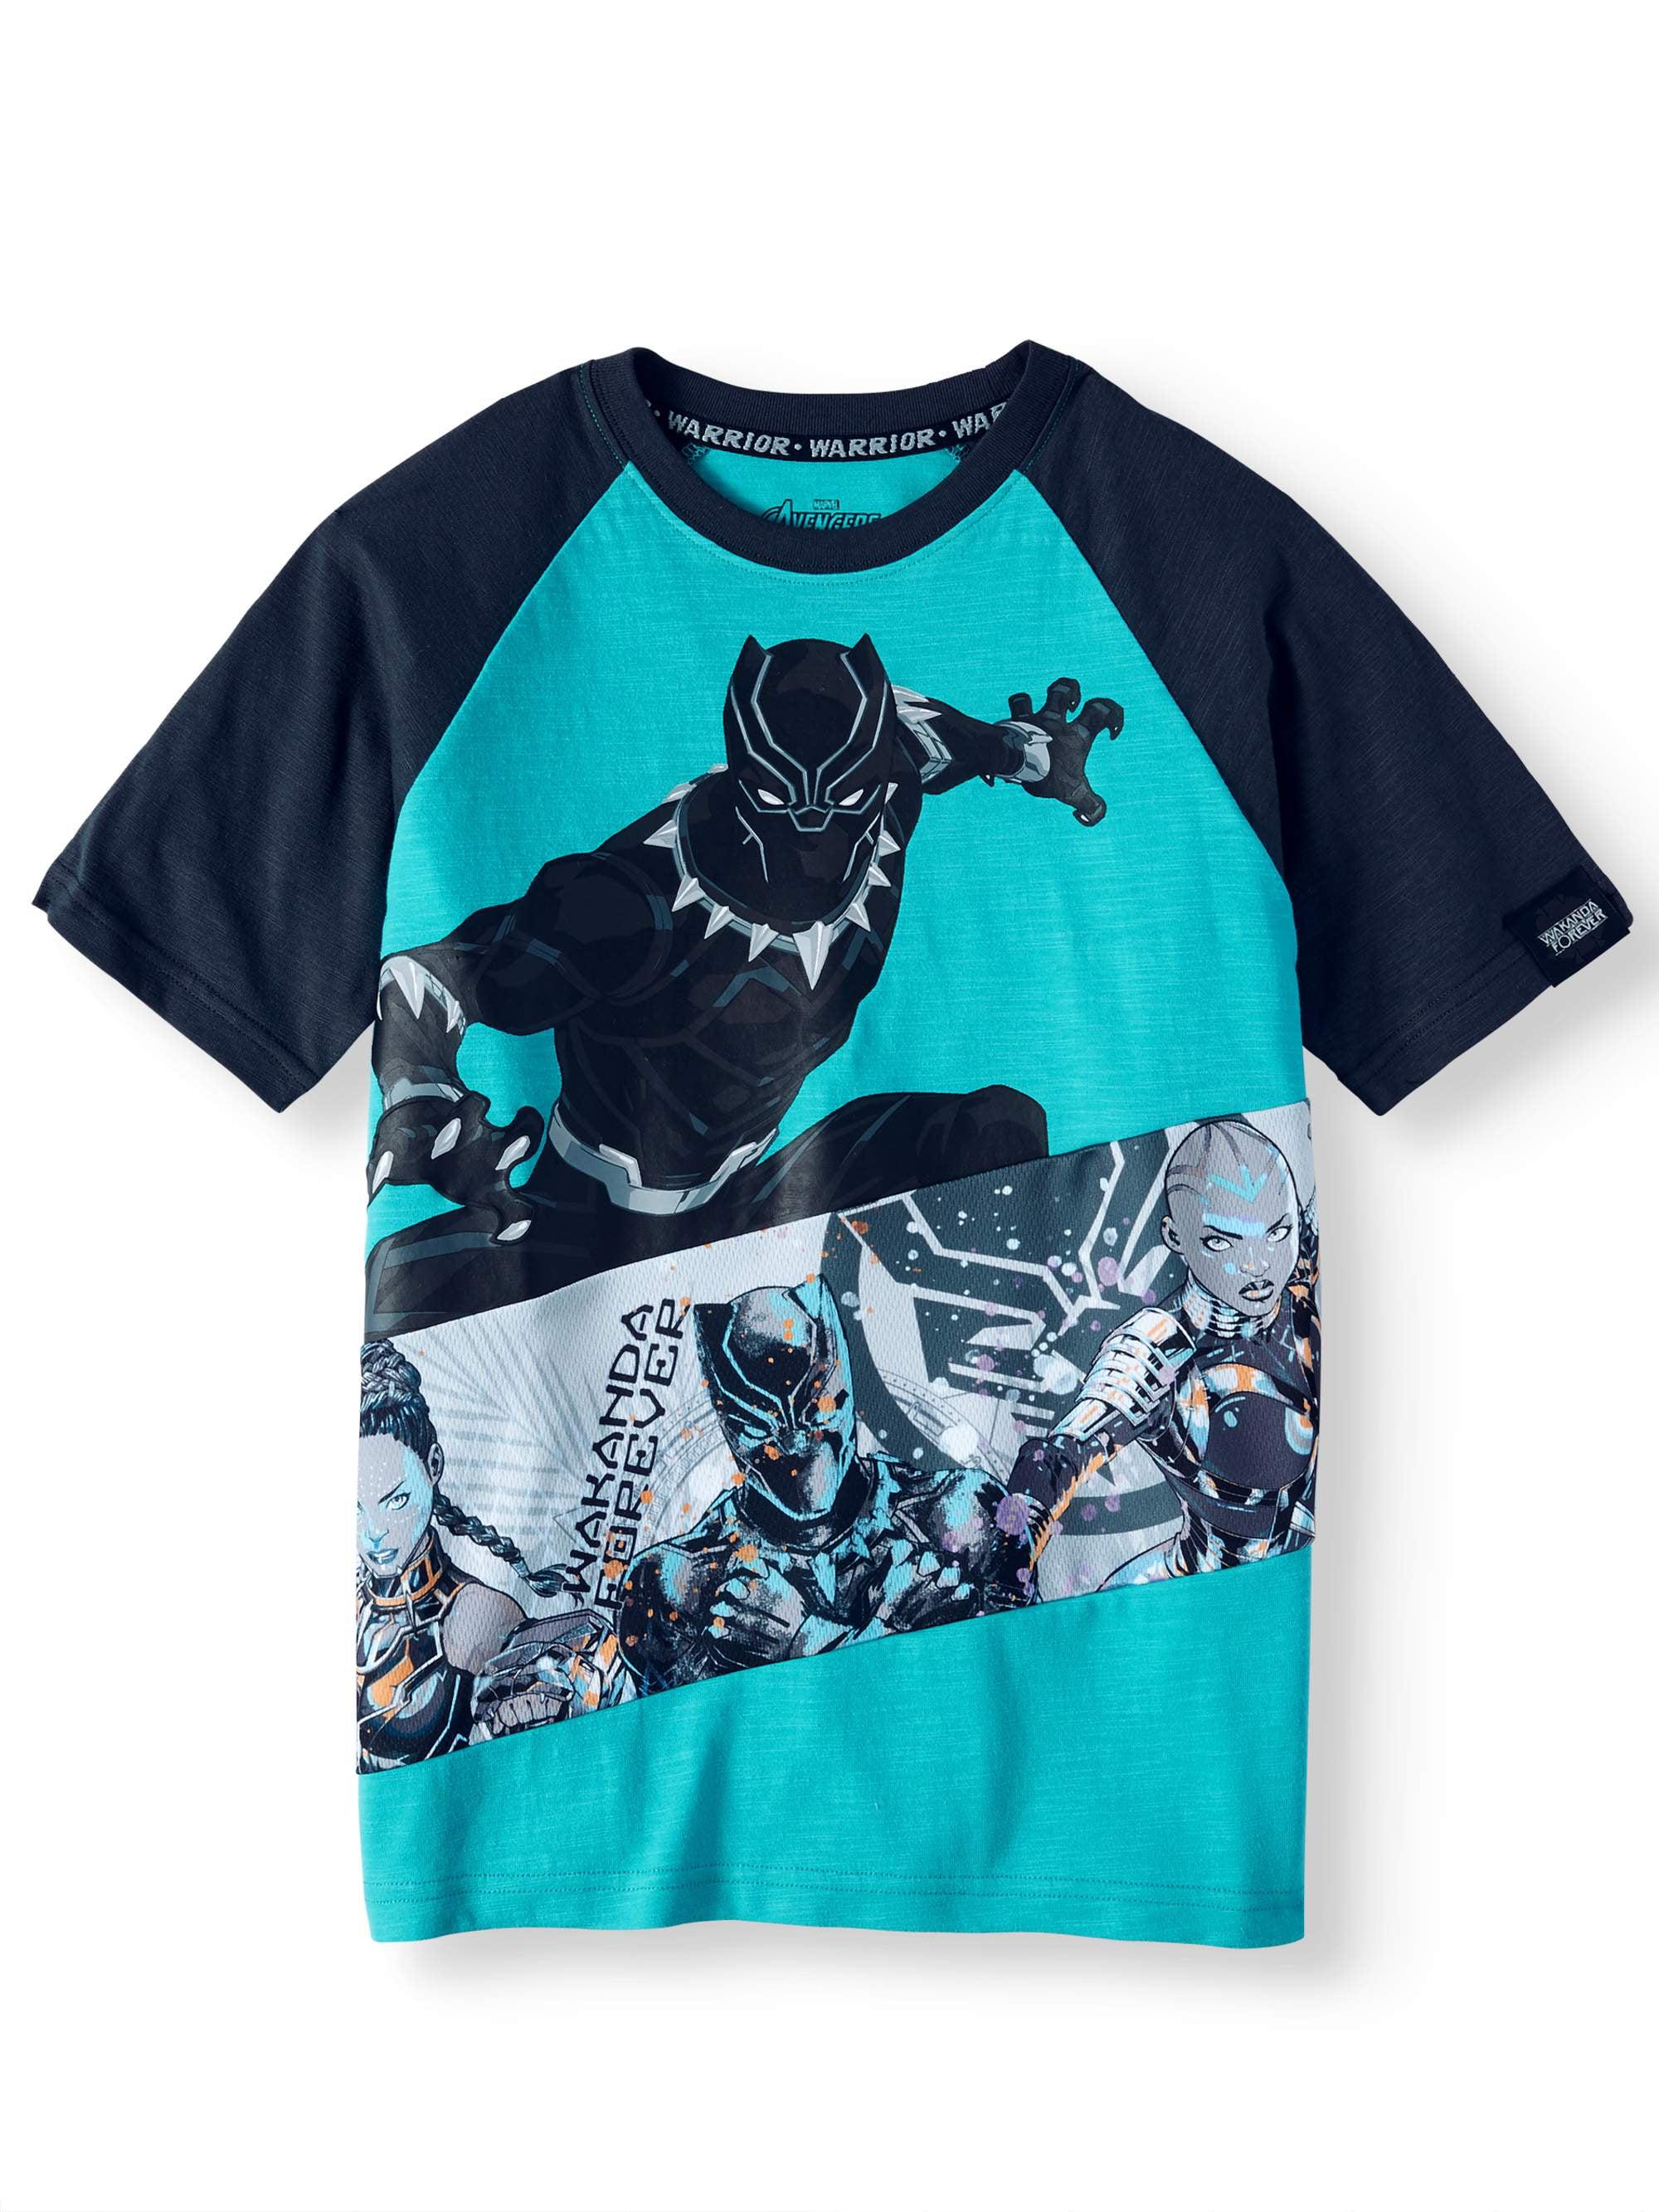 Marvel Little Boys Black Panther Movie Big Face Short Sleeve T-Shirt Sizes 4-7